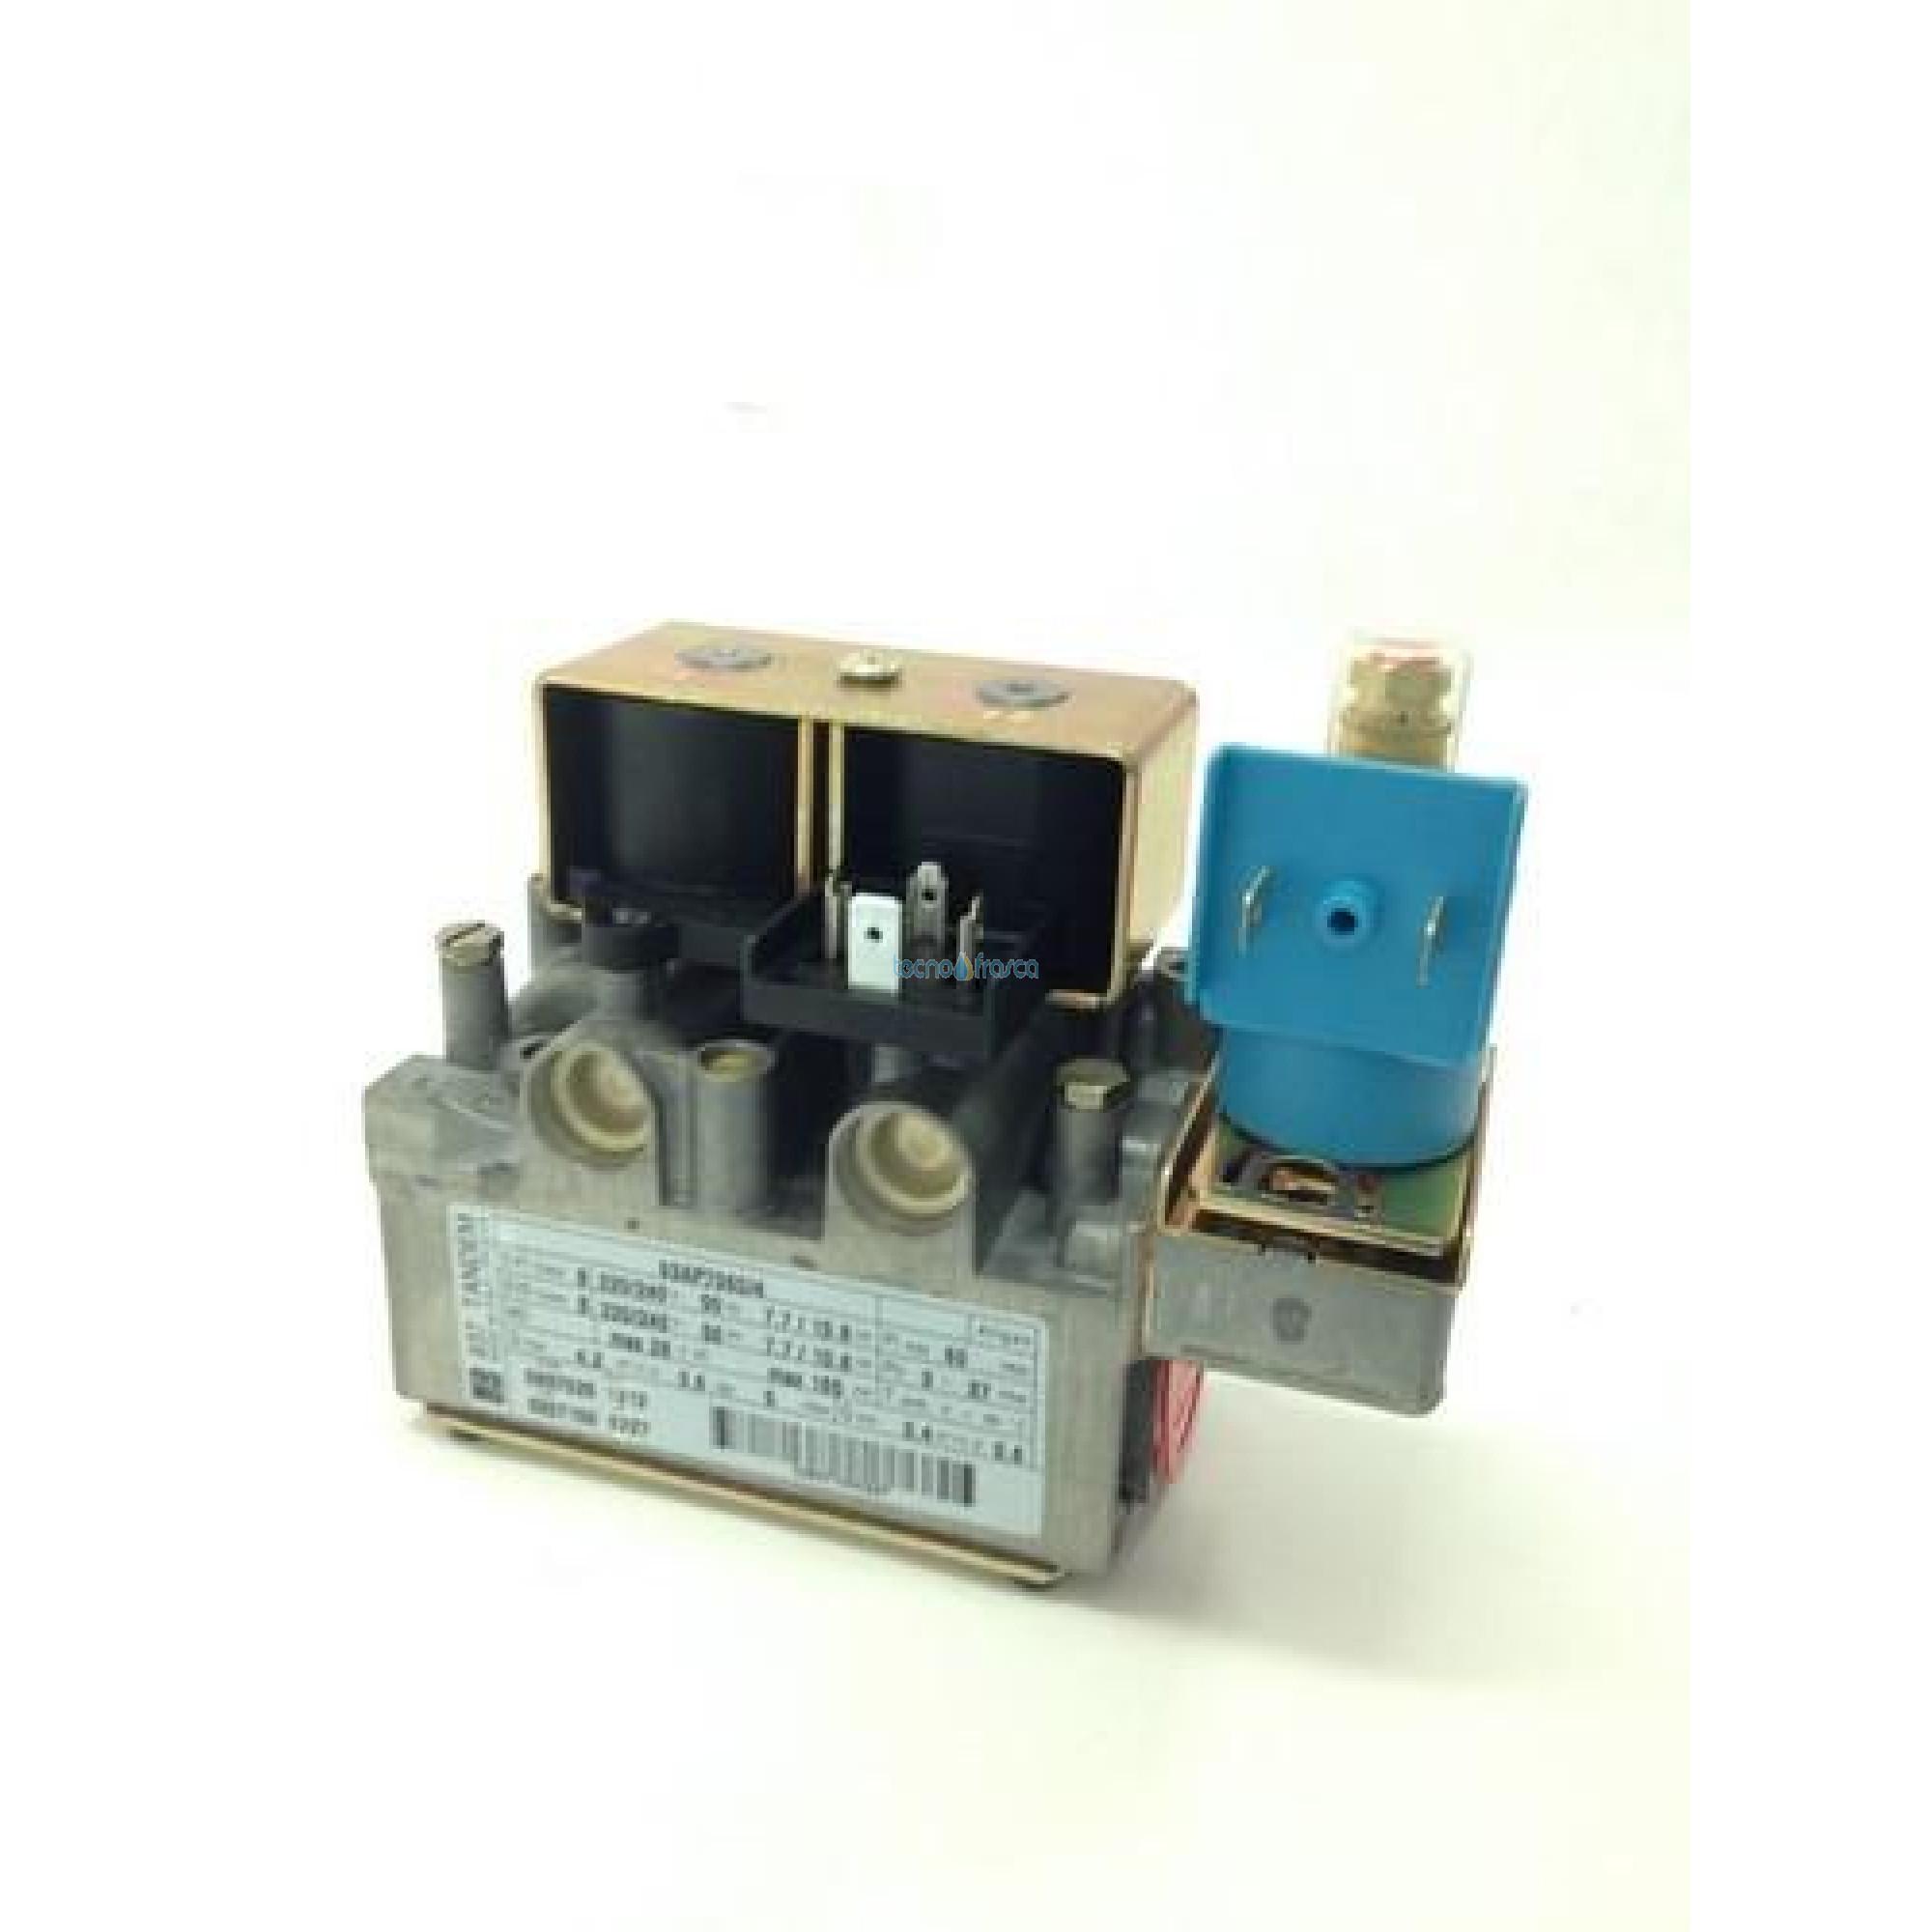 Immergas valvola gas 837 tandem 1.021493